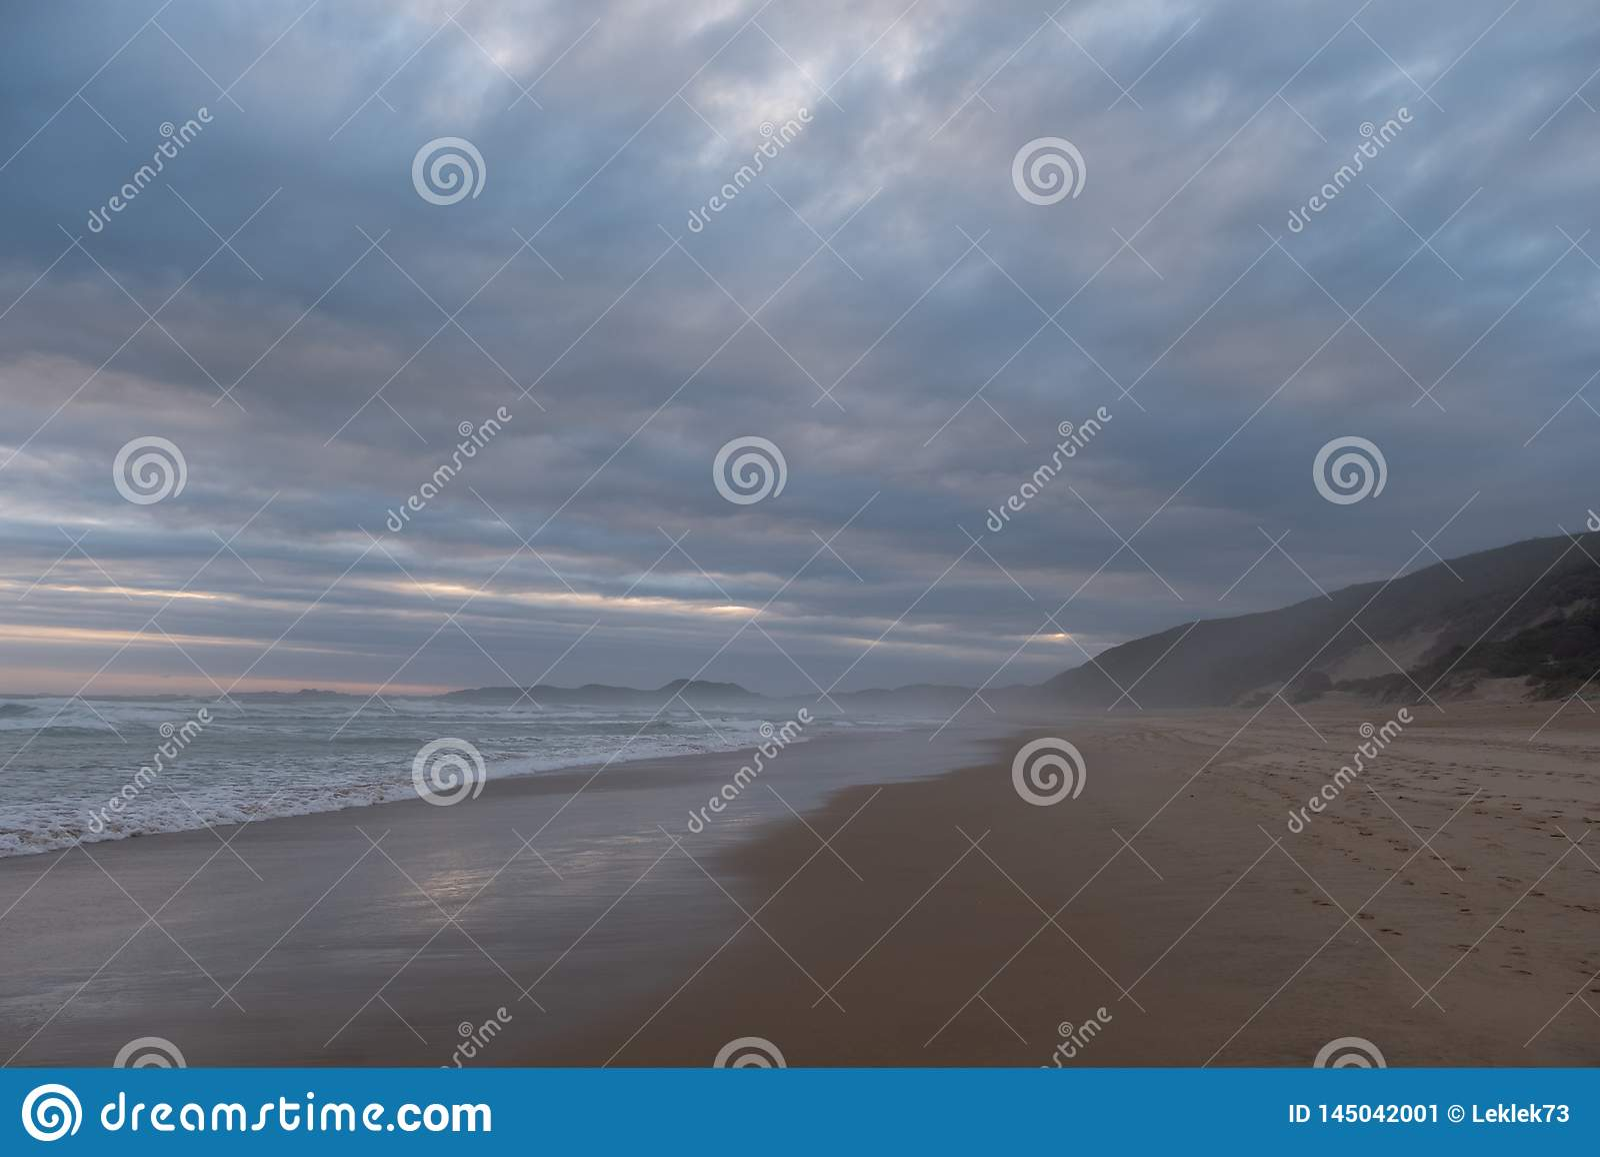 Ruhiger sandiger Strand bei Brenton auf Meer, Knysna, fotografiert bei Sonnenuntergang, Südafrika